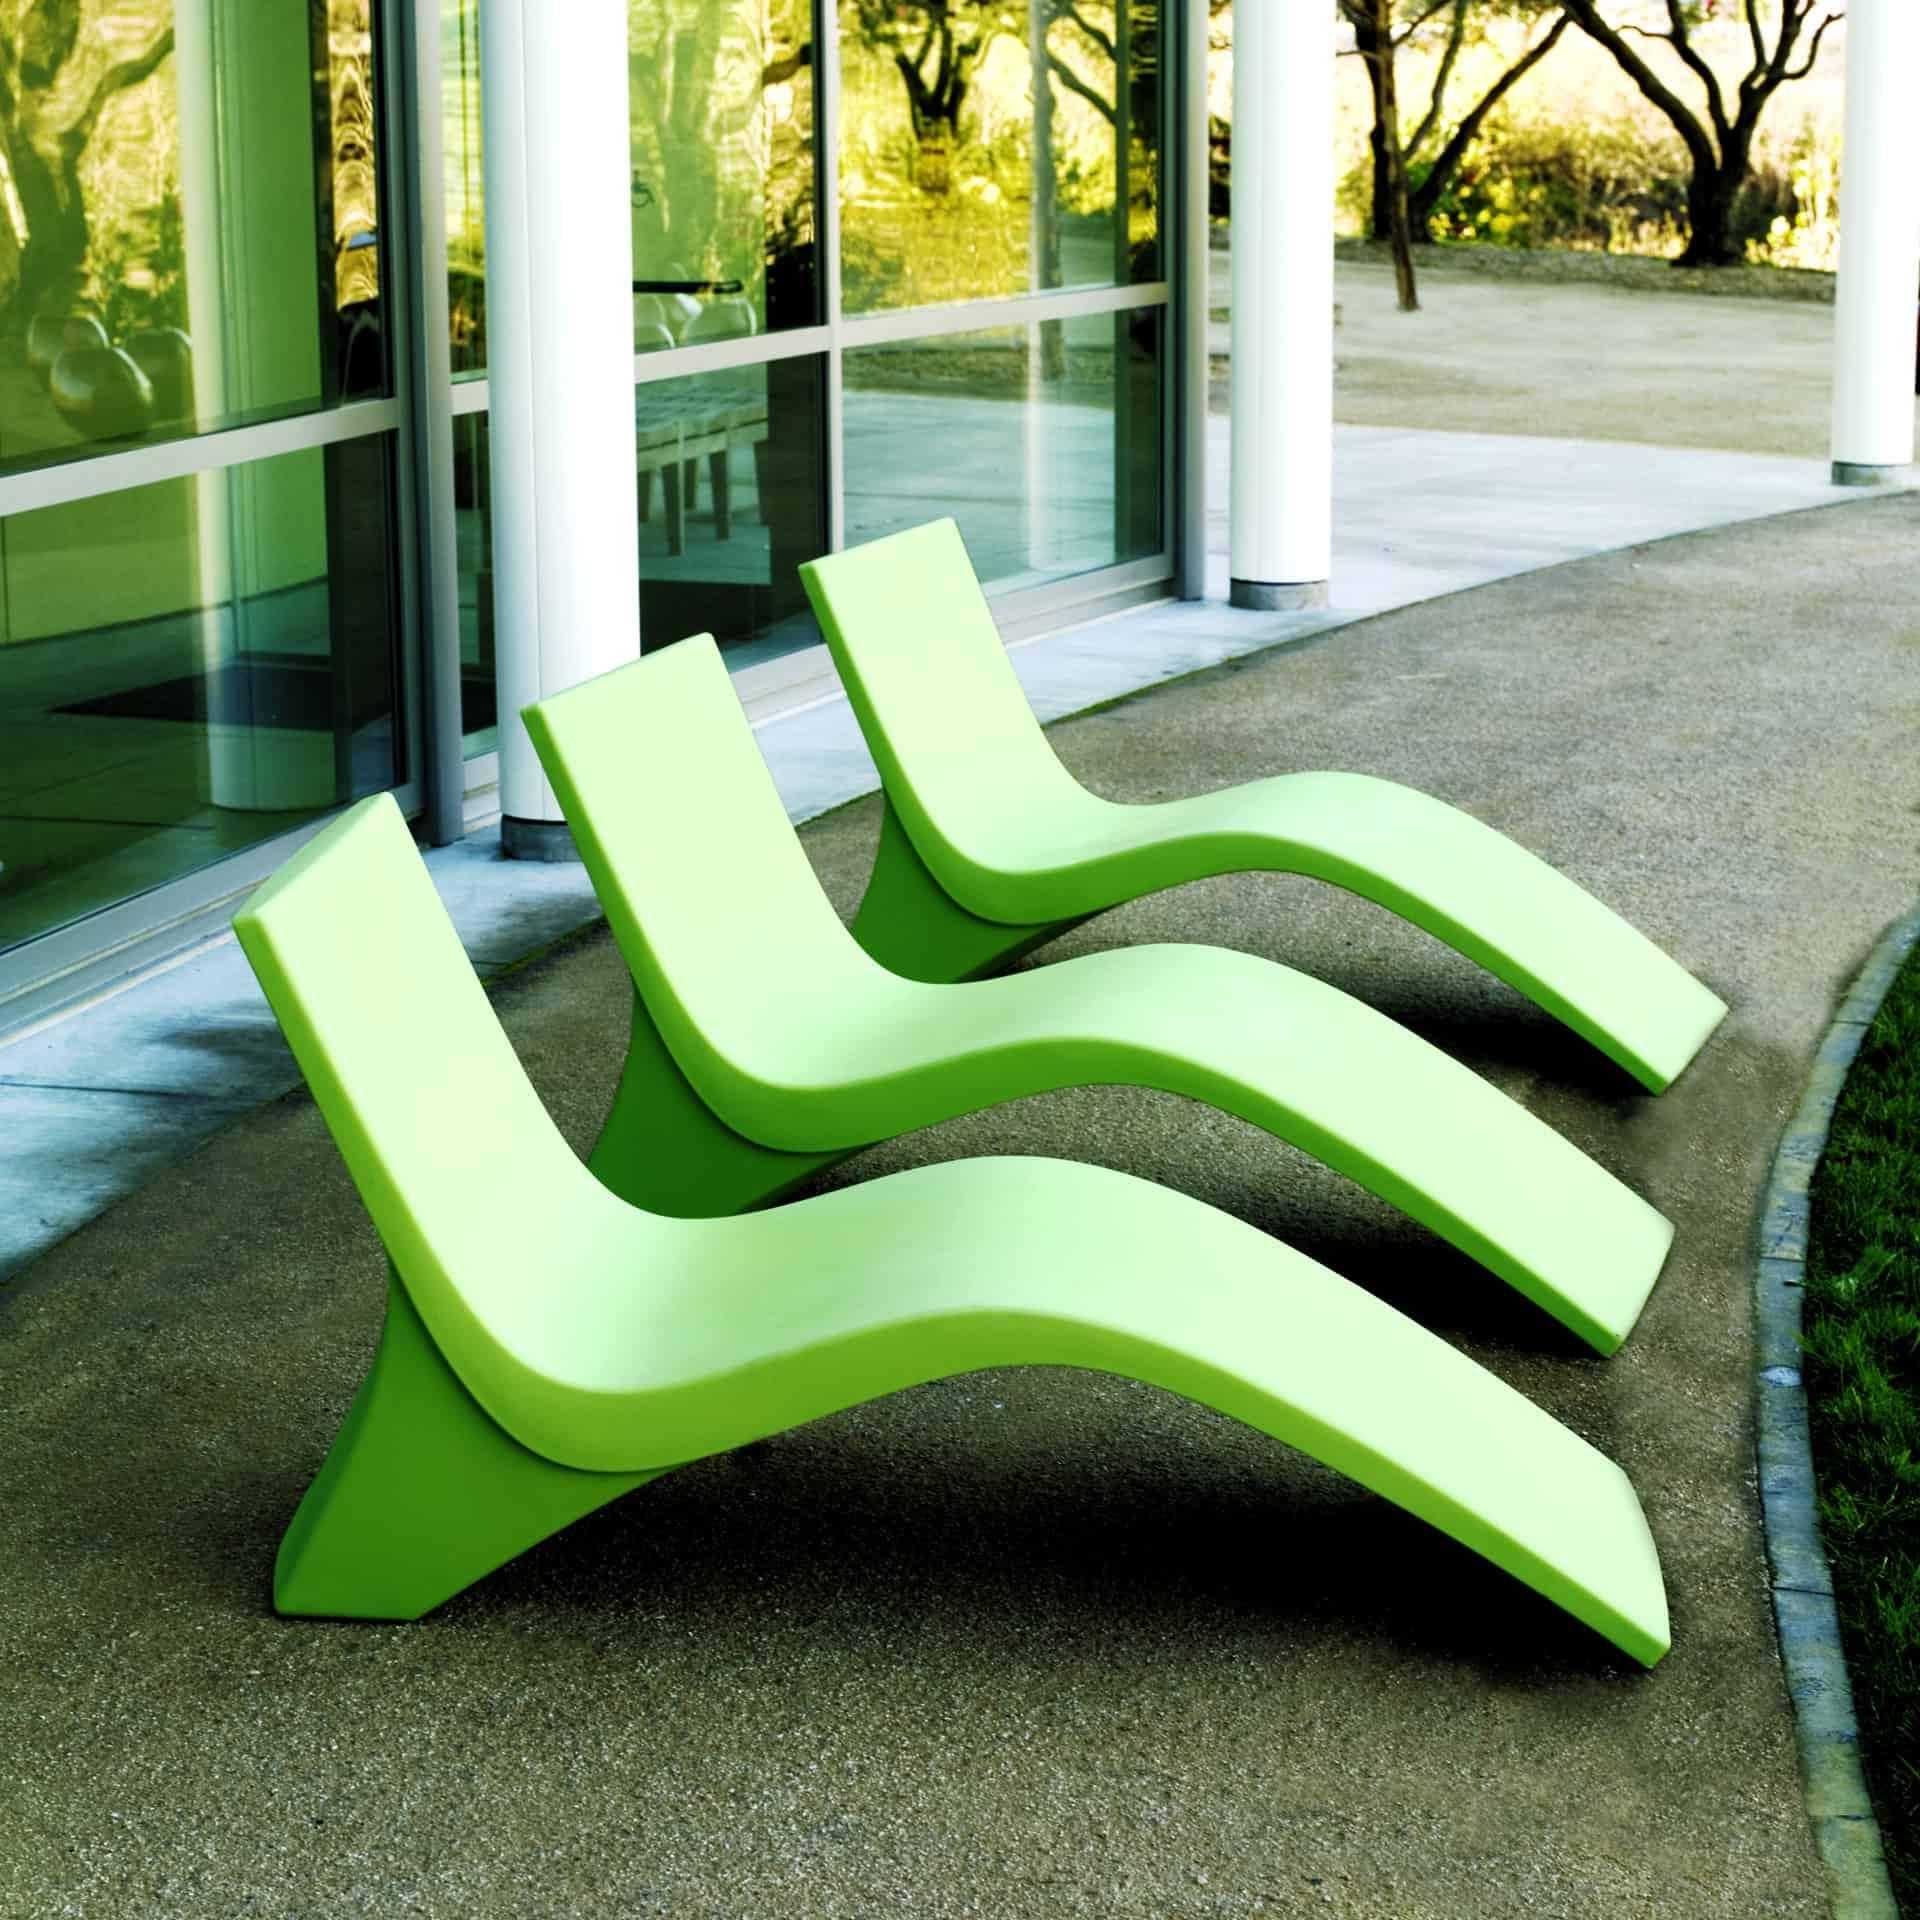 landscapeforms chill lounge seo website links